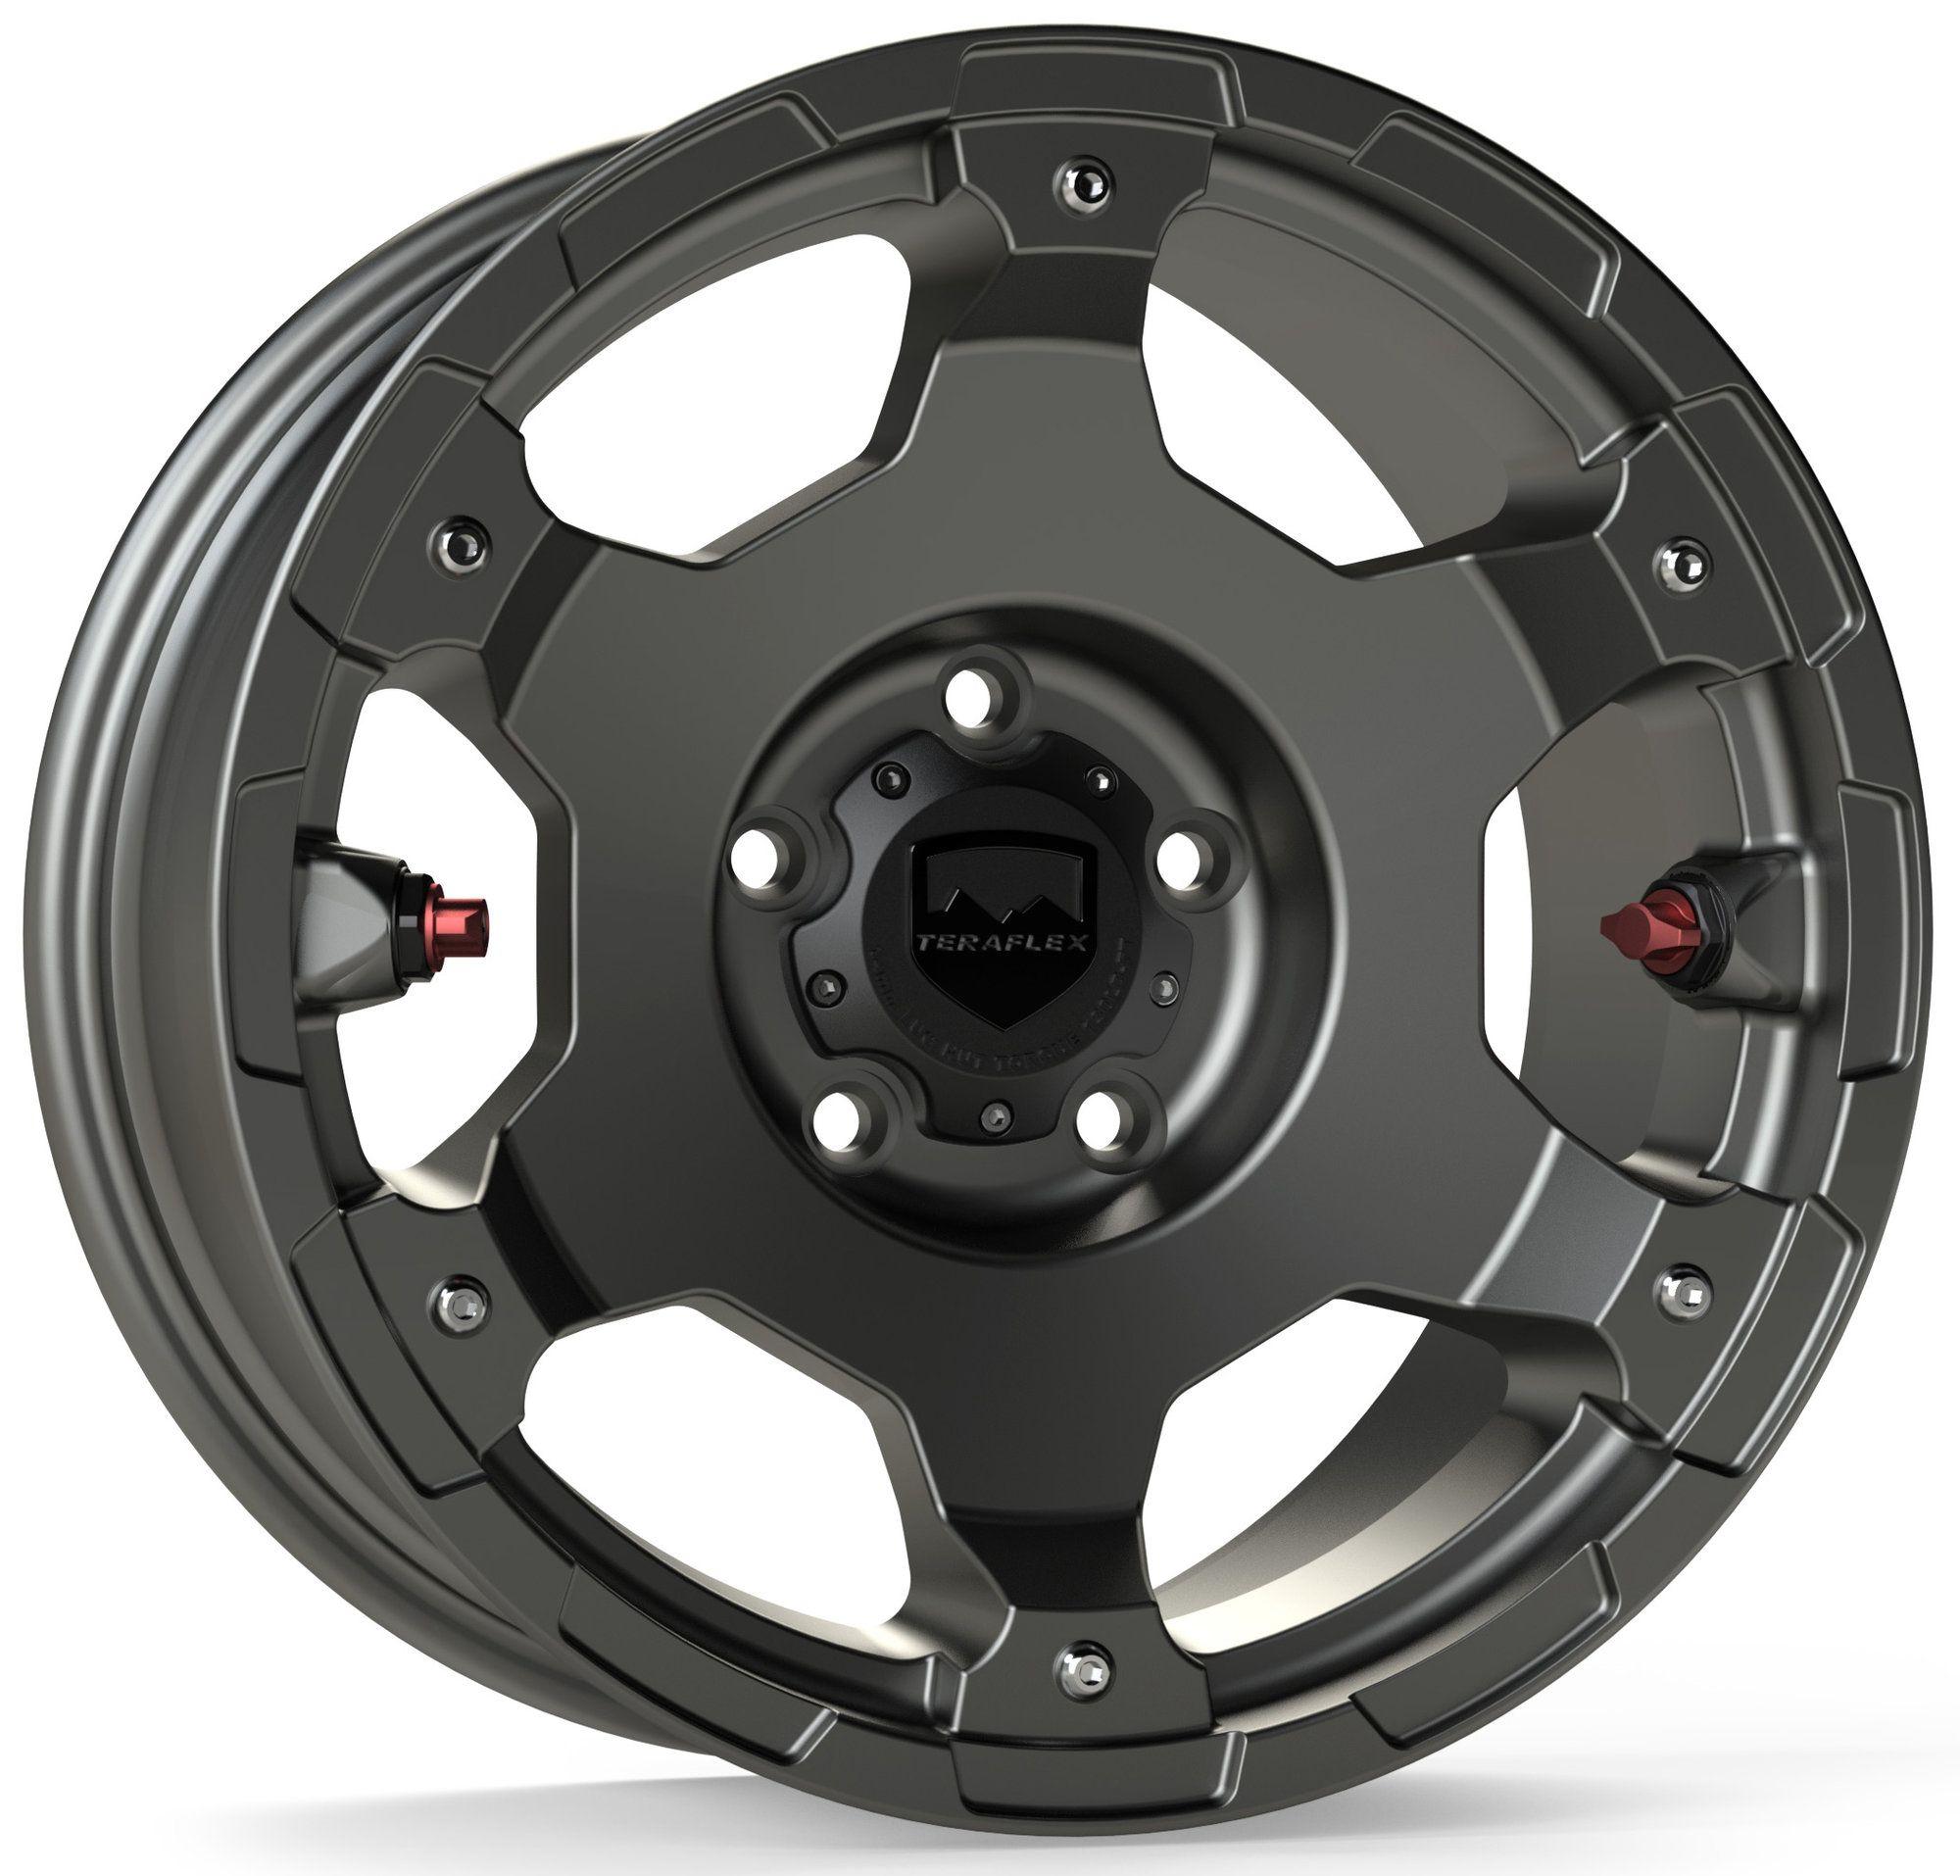 Teraflex Base Nomad Wheel in Titanium Gray for 0720 Jeep